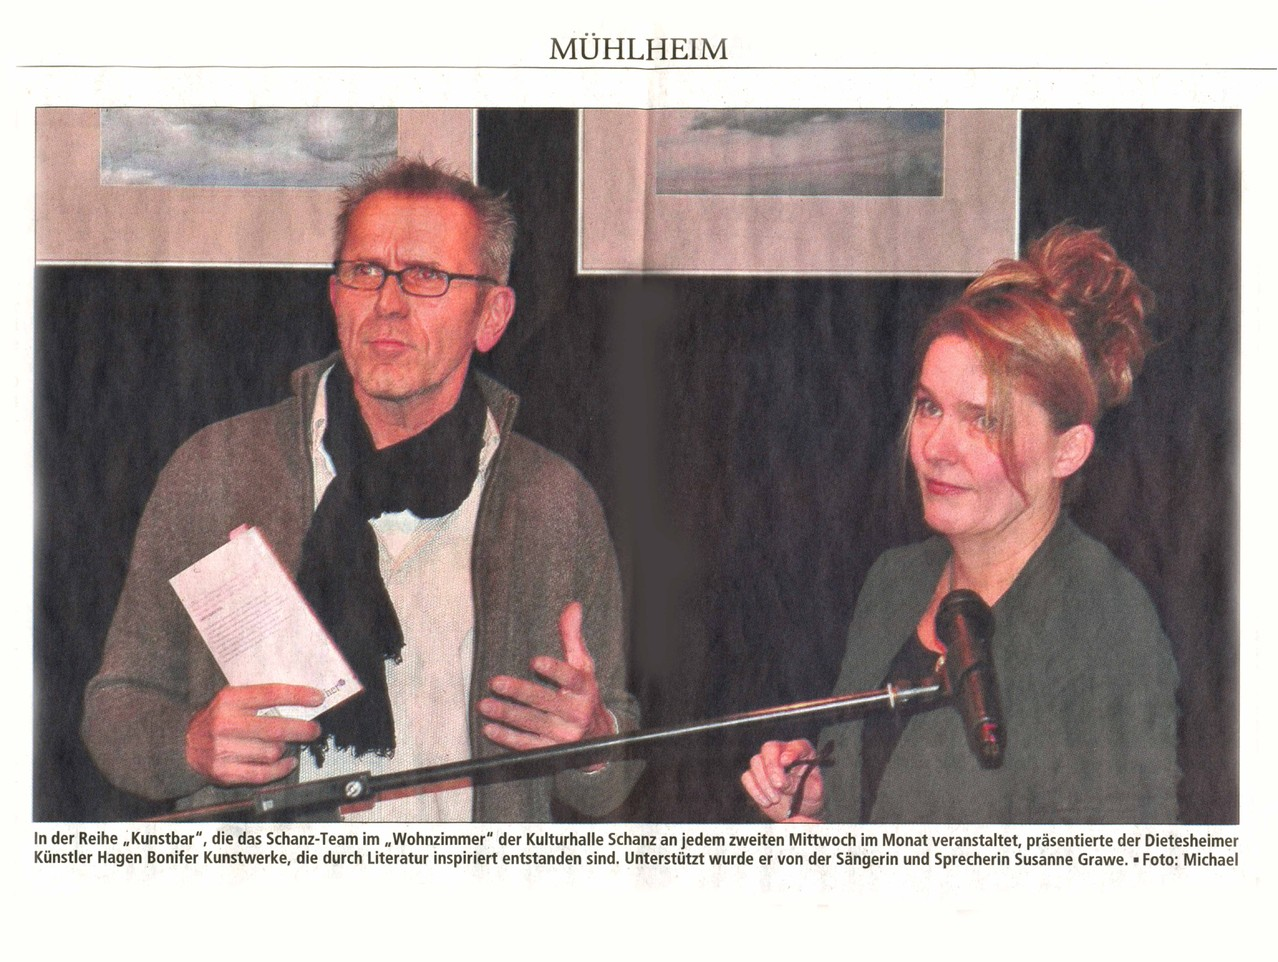 Offenbach Post, 11. Januar 2013